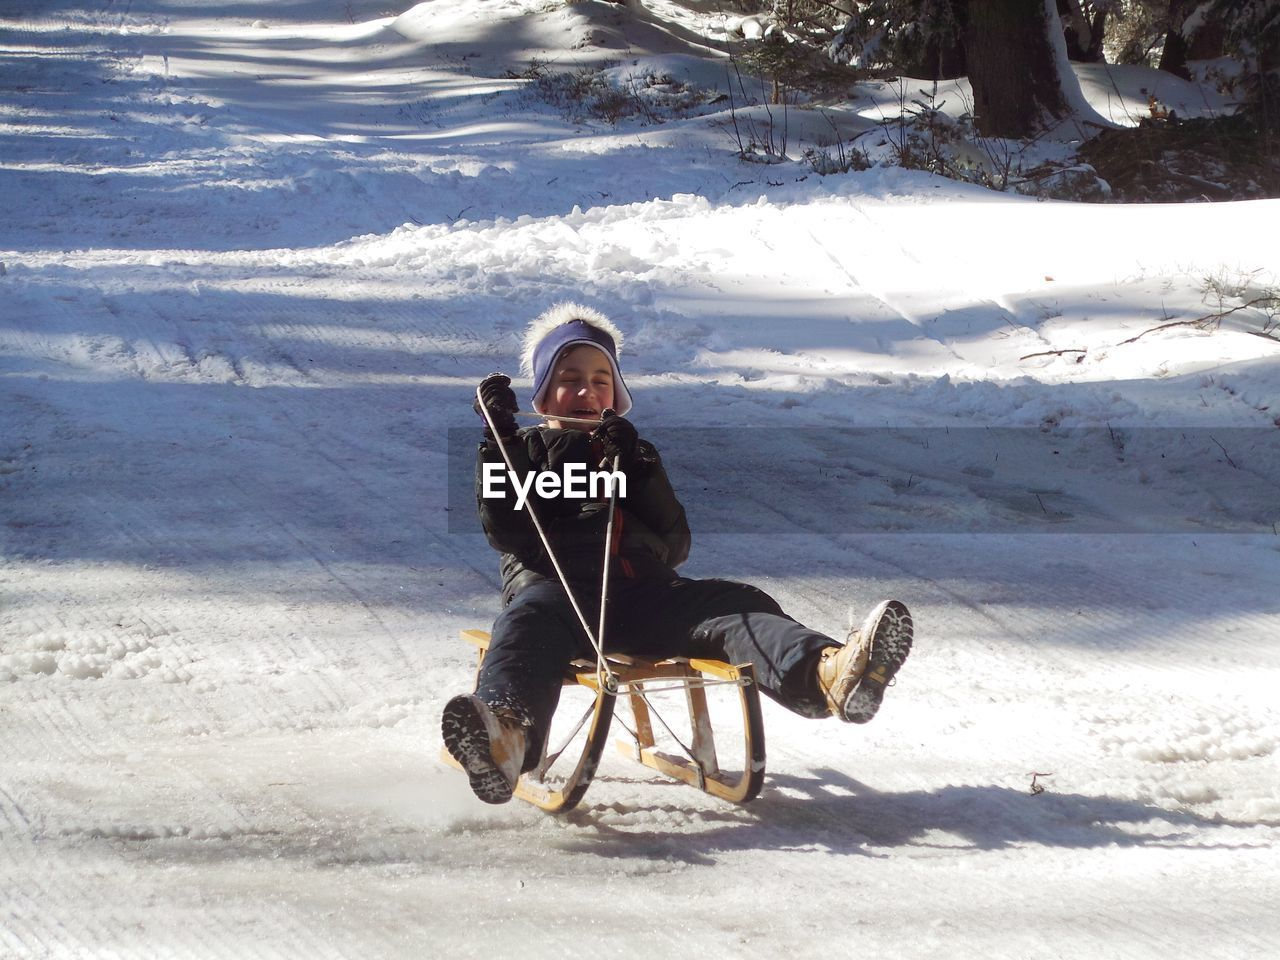 Boy riding sled on snow